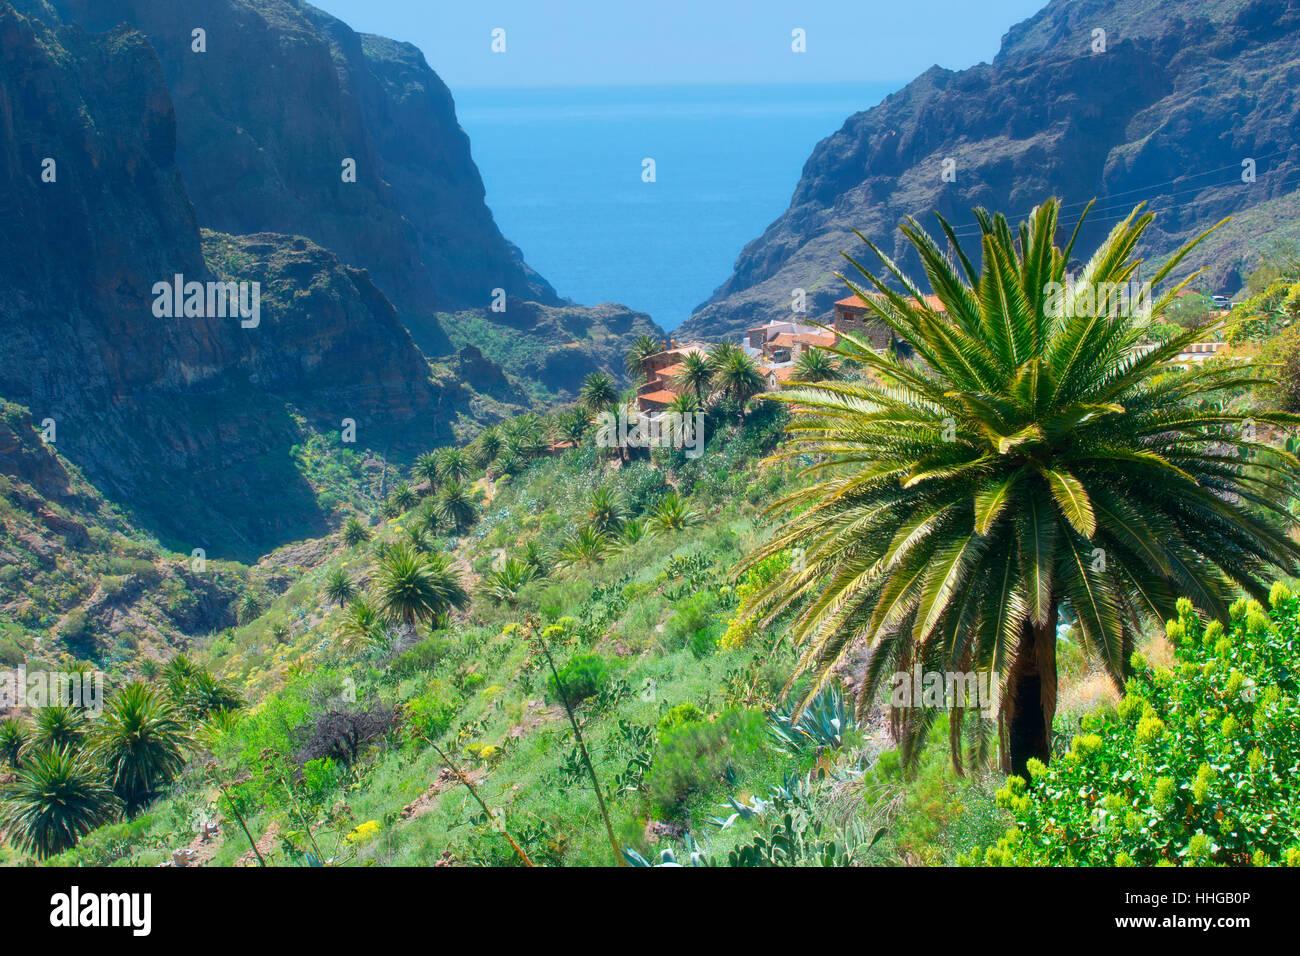 The village of Masca, Tenerife - Stock Image